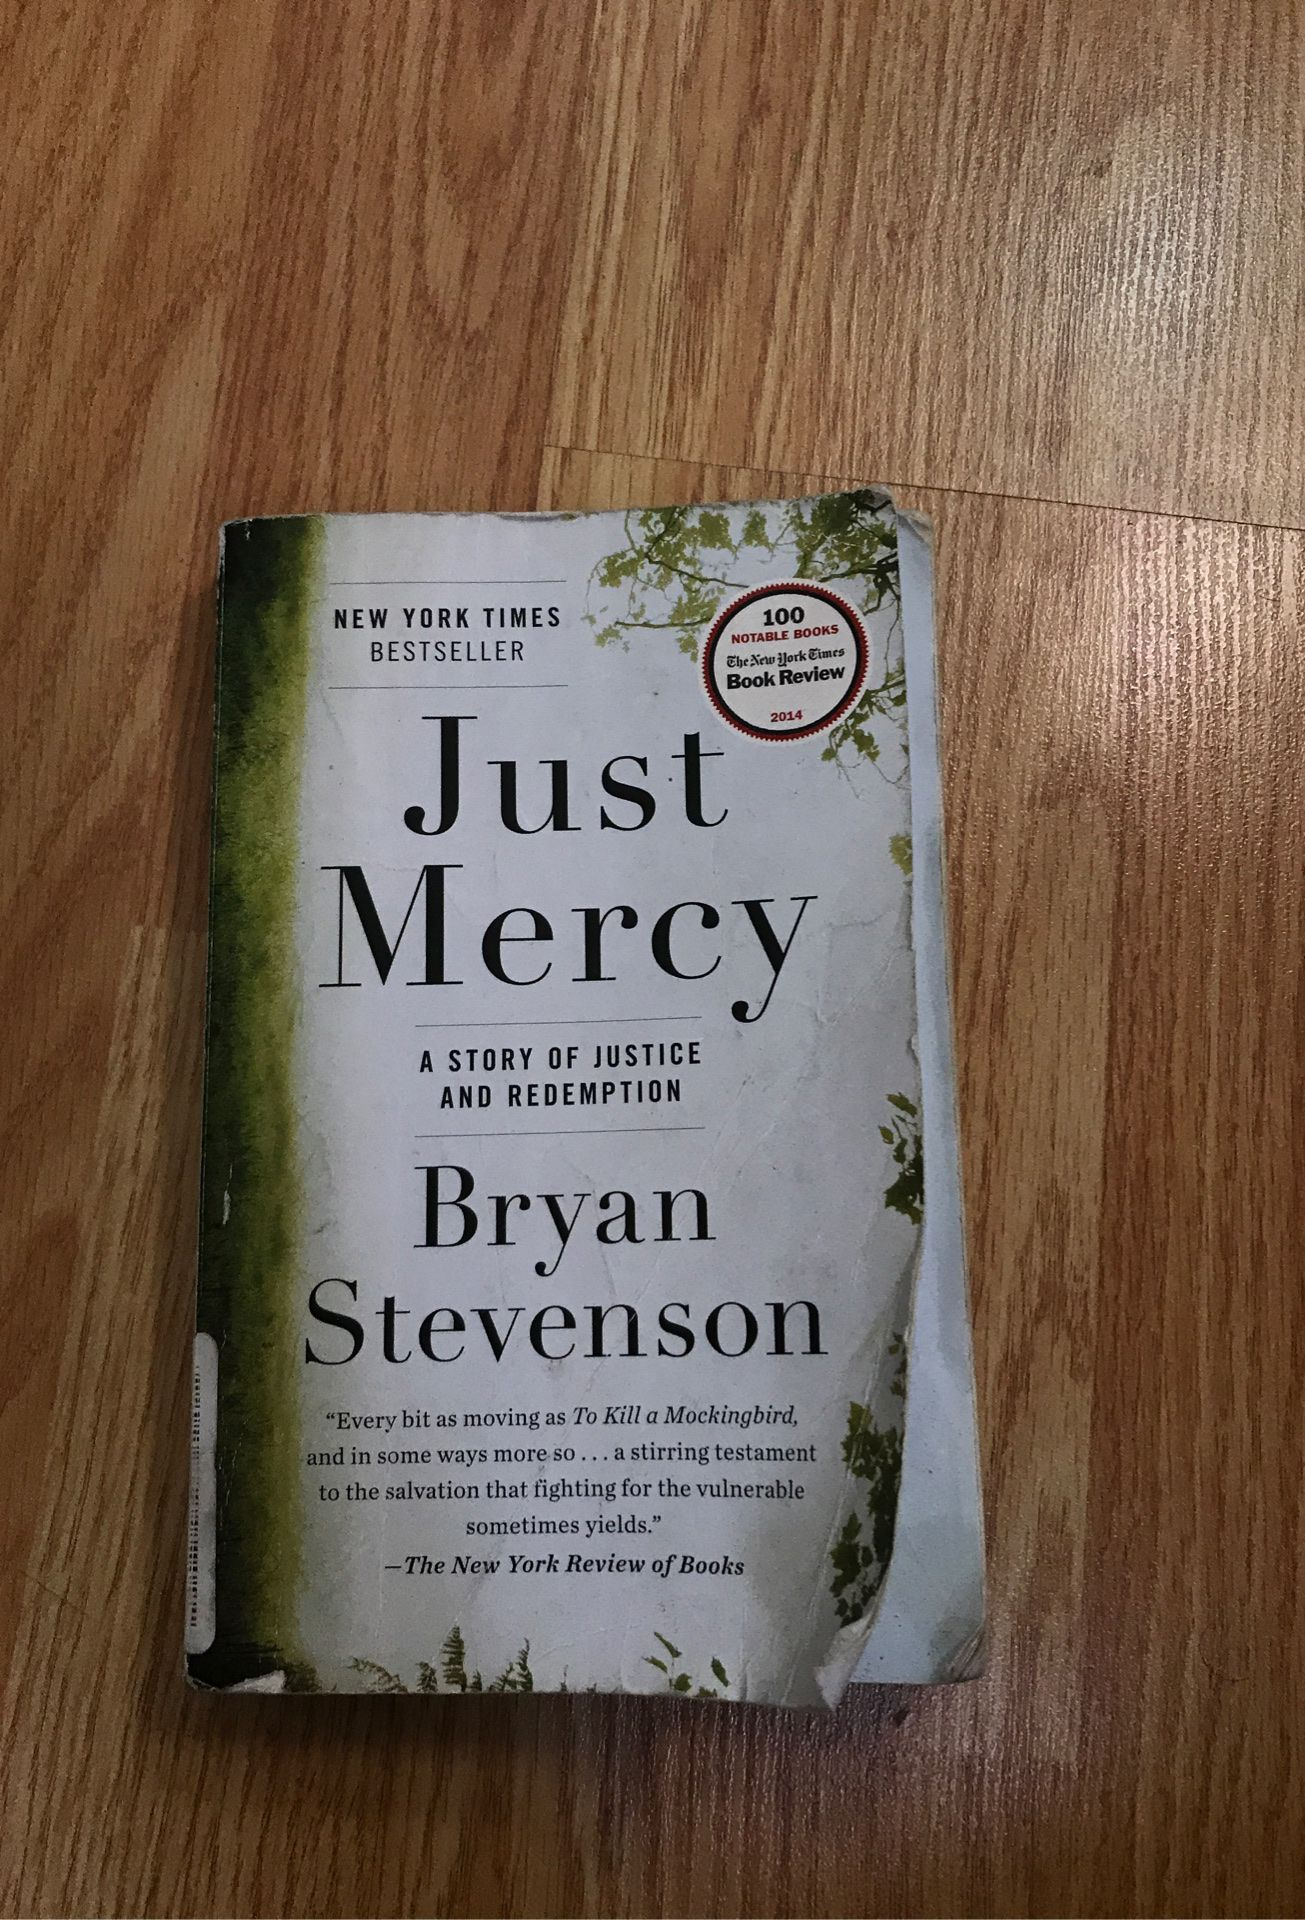 Just Mercy book by Bryan Stevenson